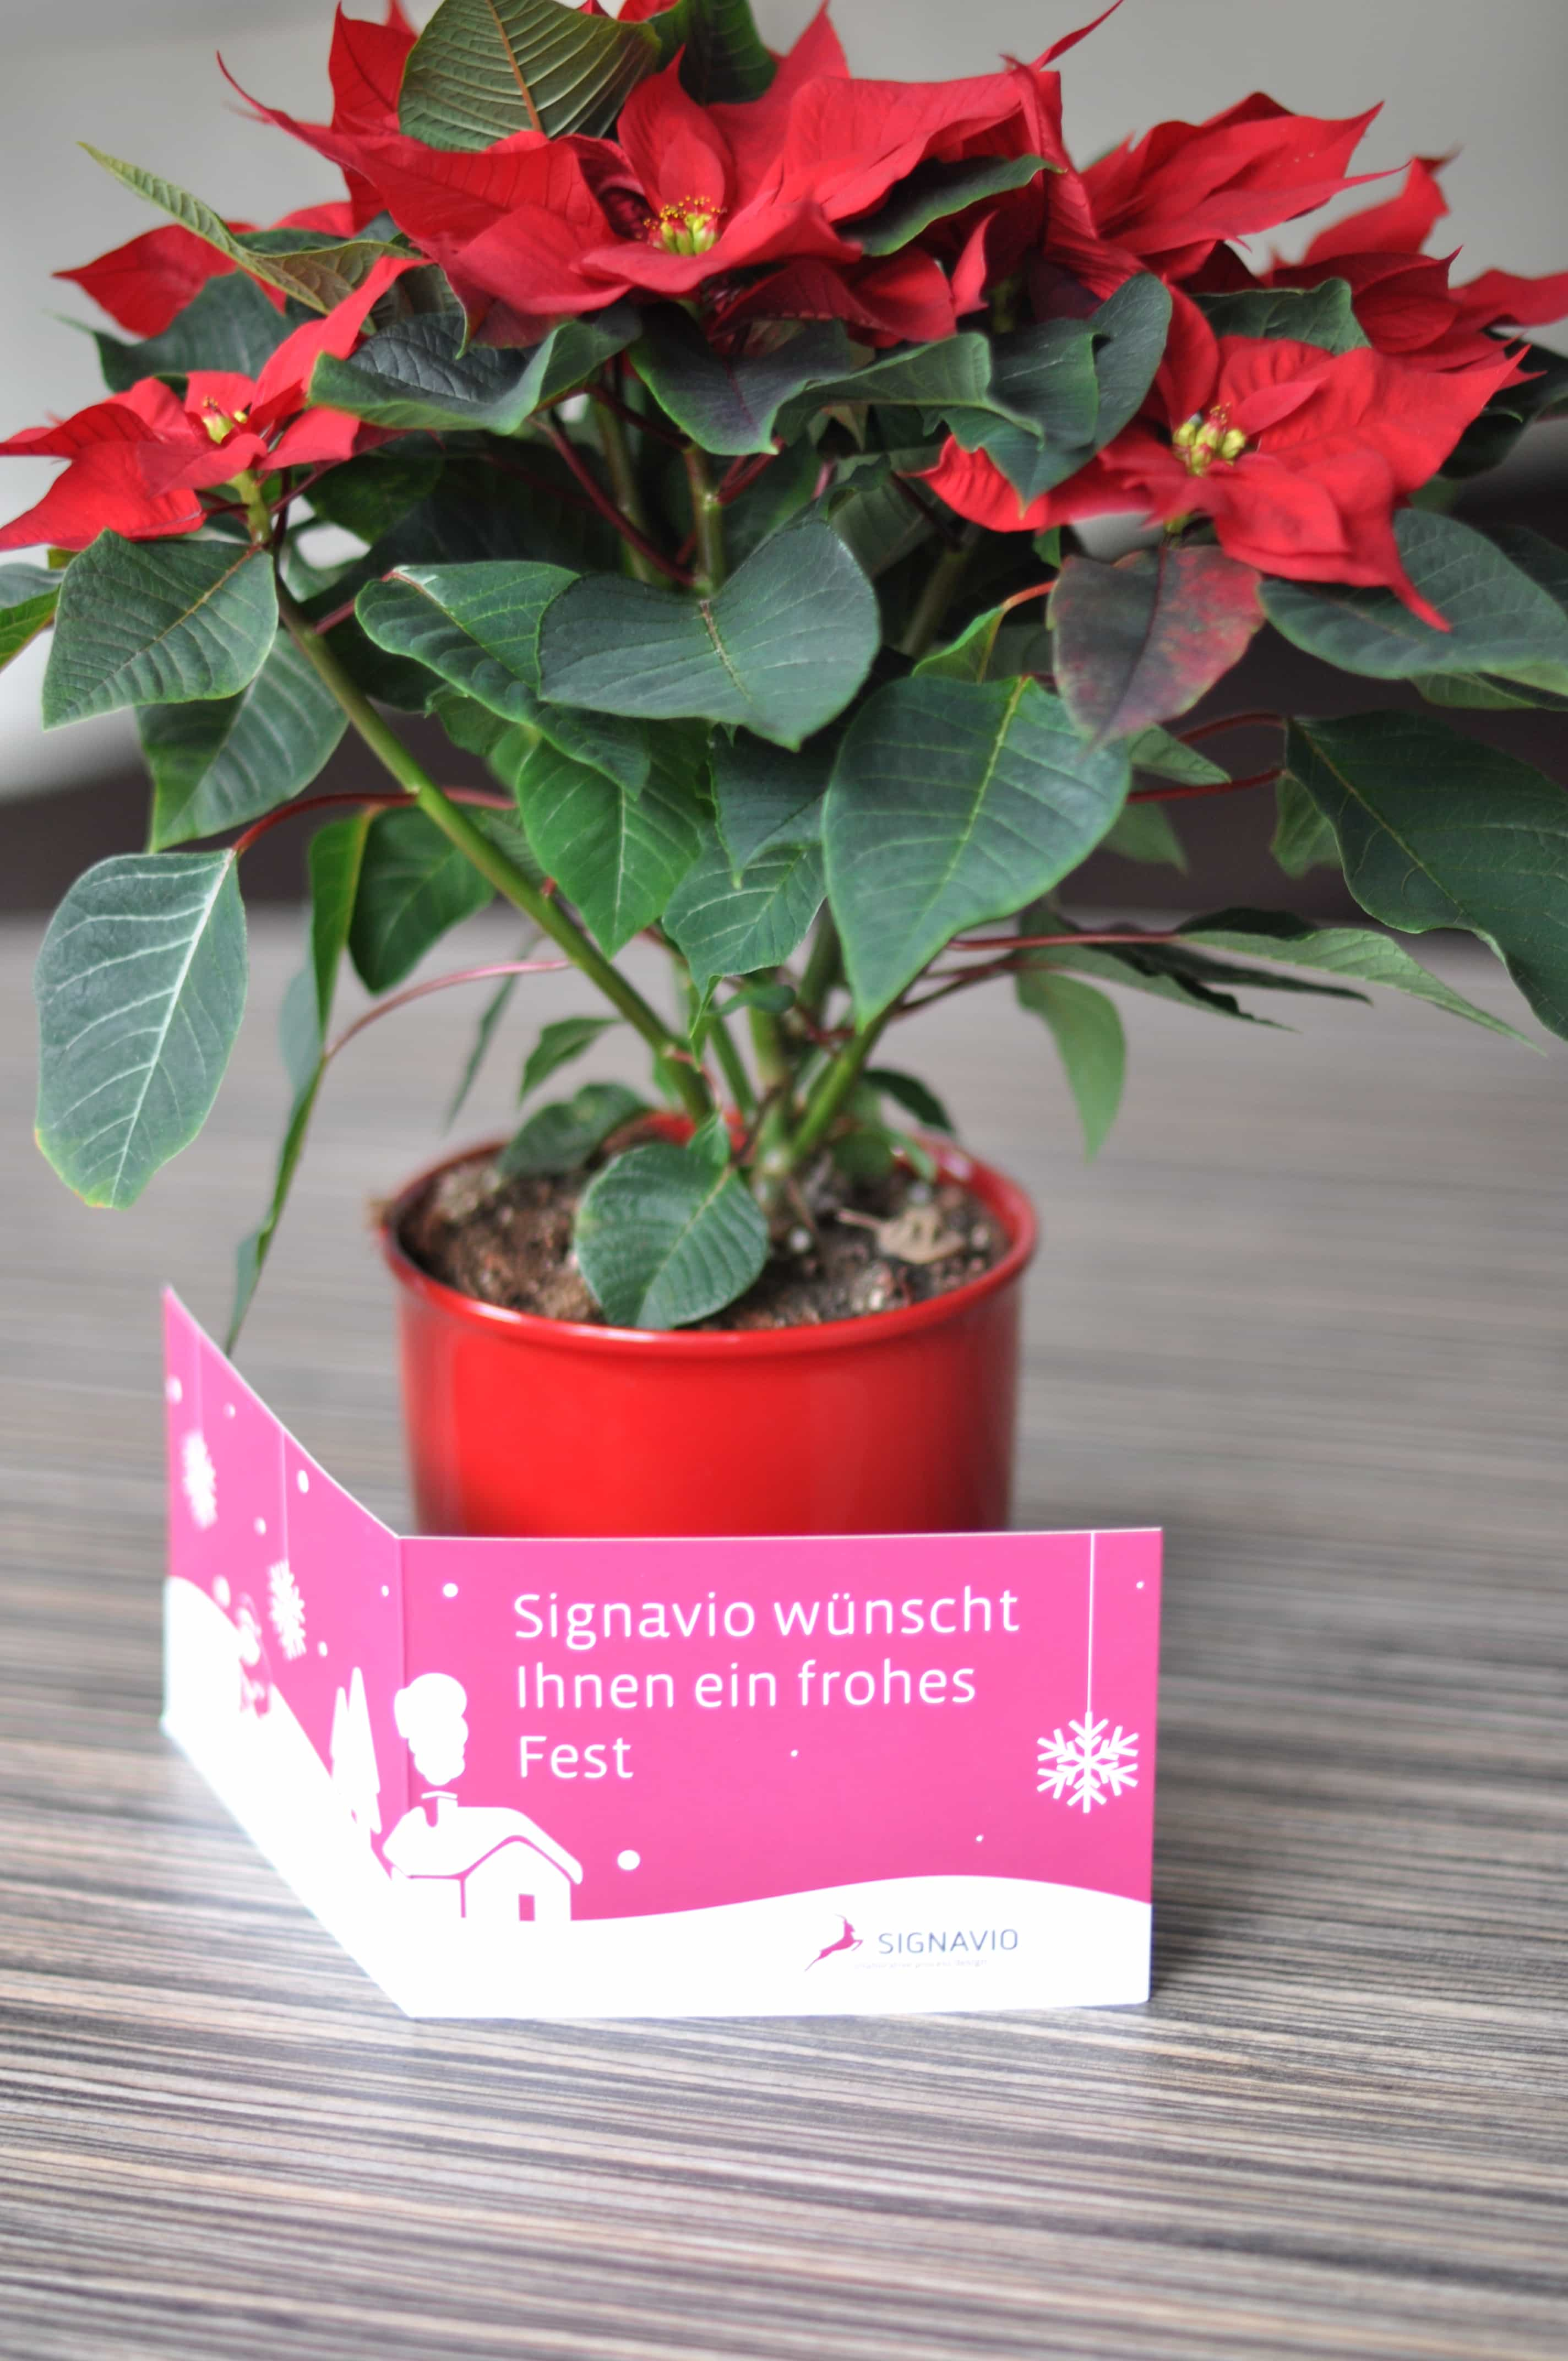 Signavio wünscht Frohe Weihnachten